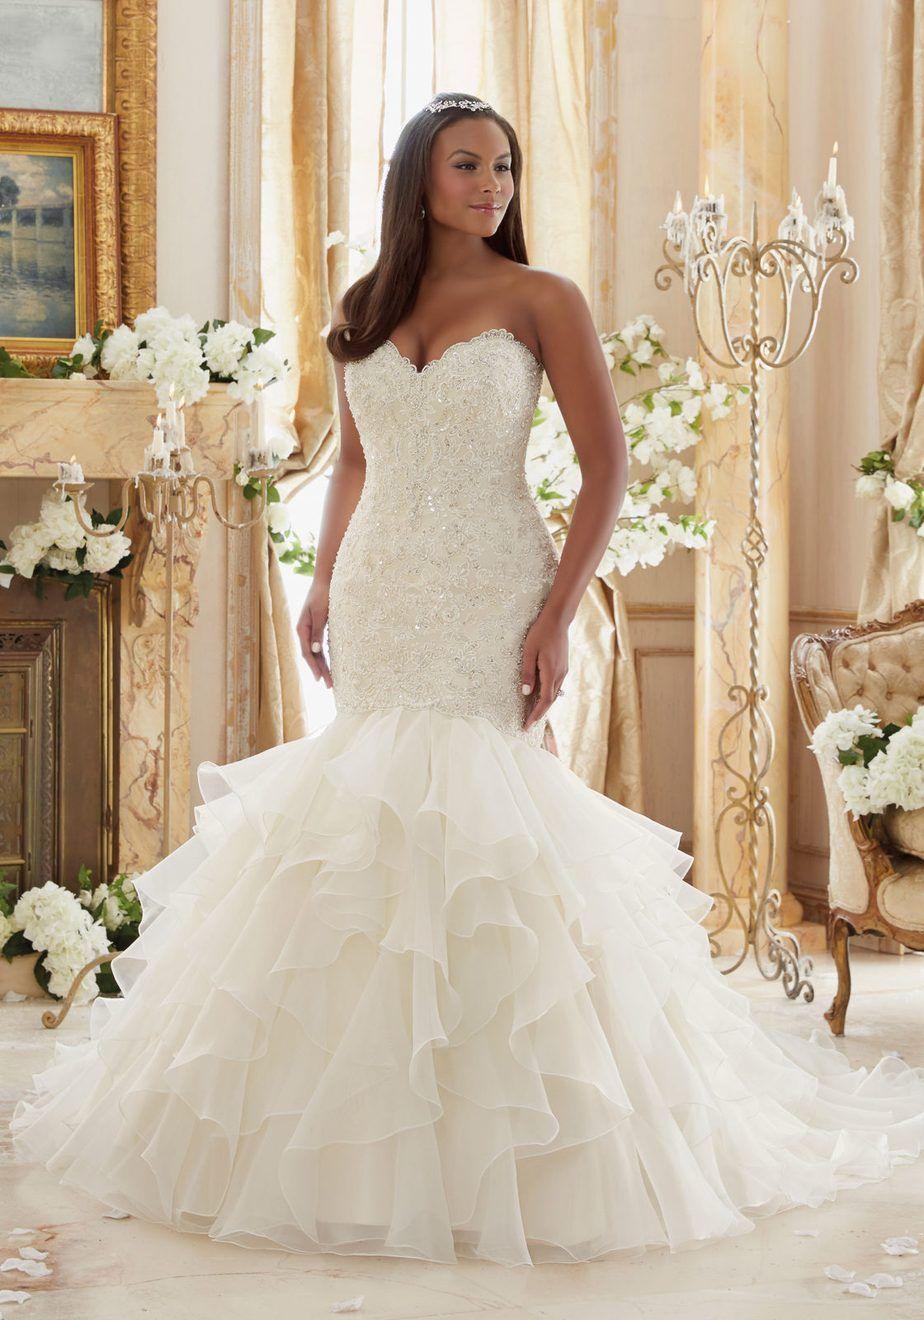 Julietta By Mori Lee 3201 Mermaid Wedding Dress Plus Size Wedding Gowns Mermaid Dresses [ 1320 x 924 Pixel ]